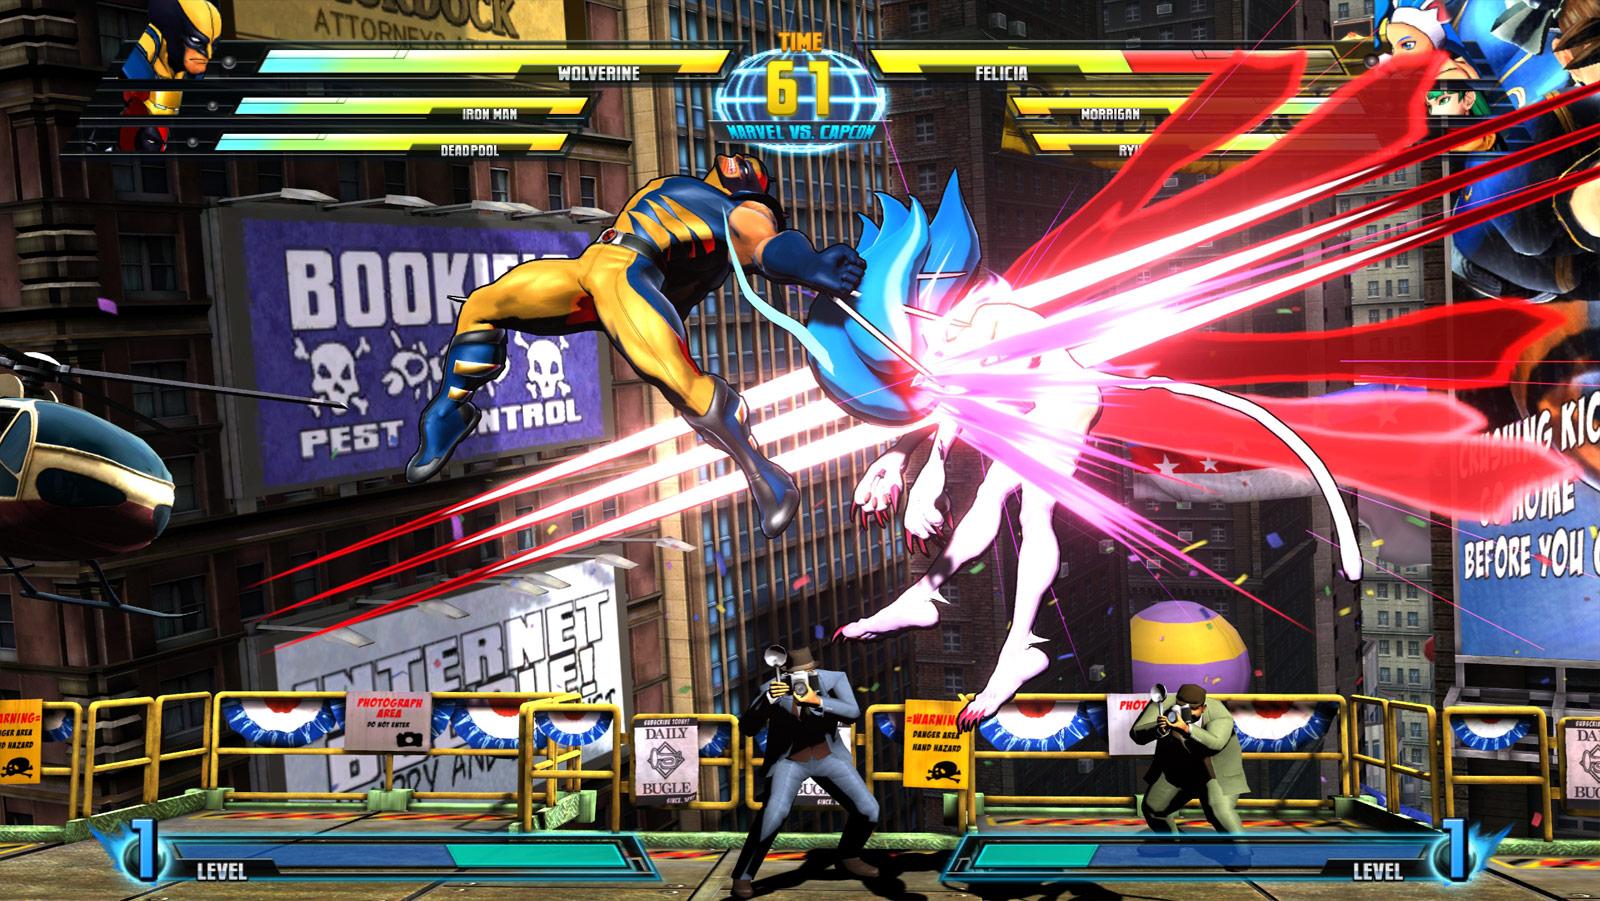 Marvel vs. Capcom 3 screen shot from E3 image #1